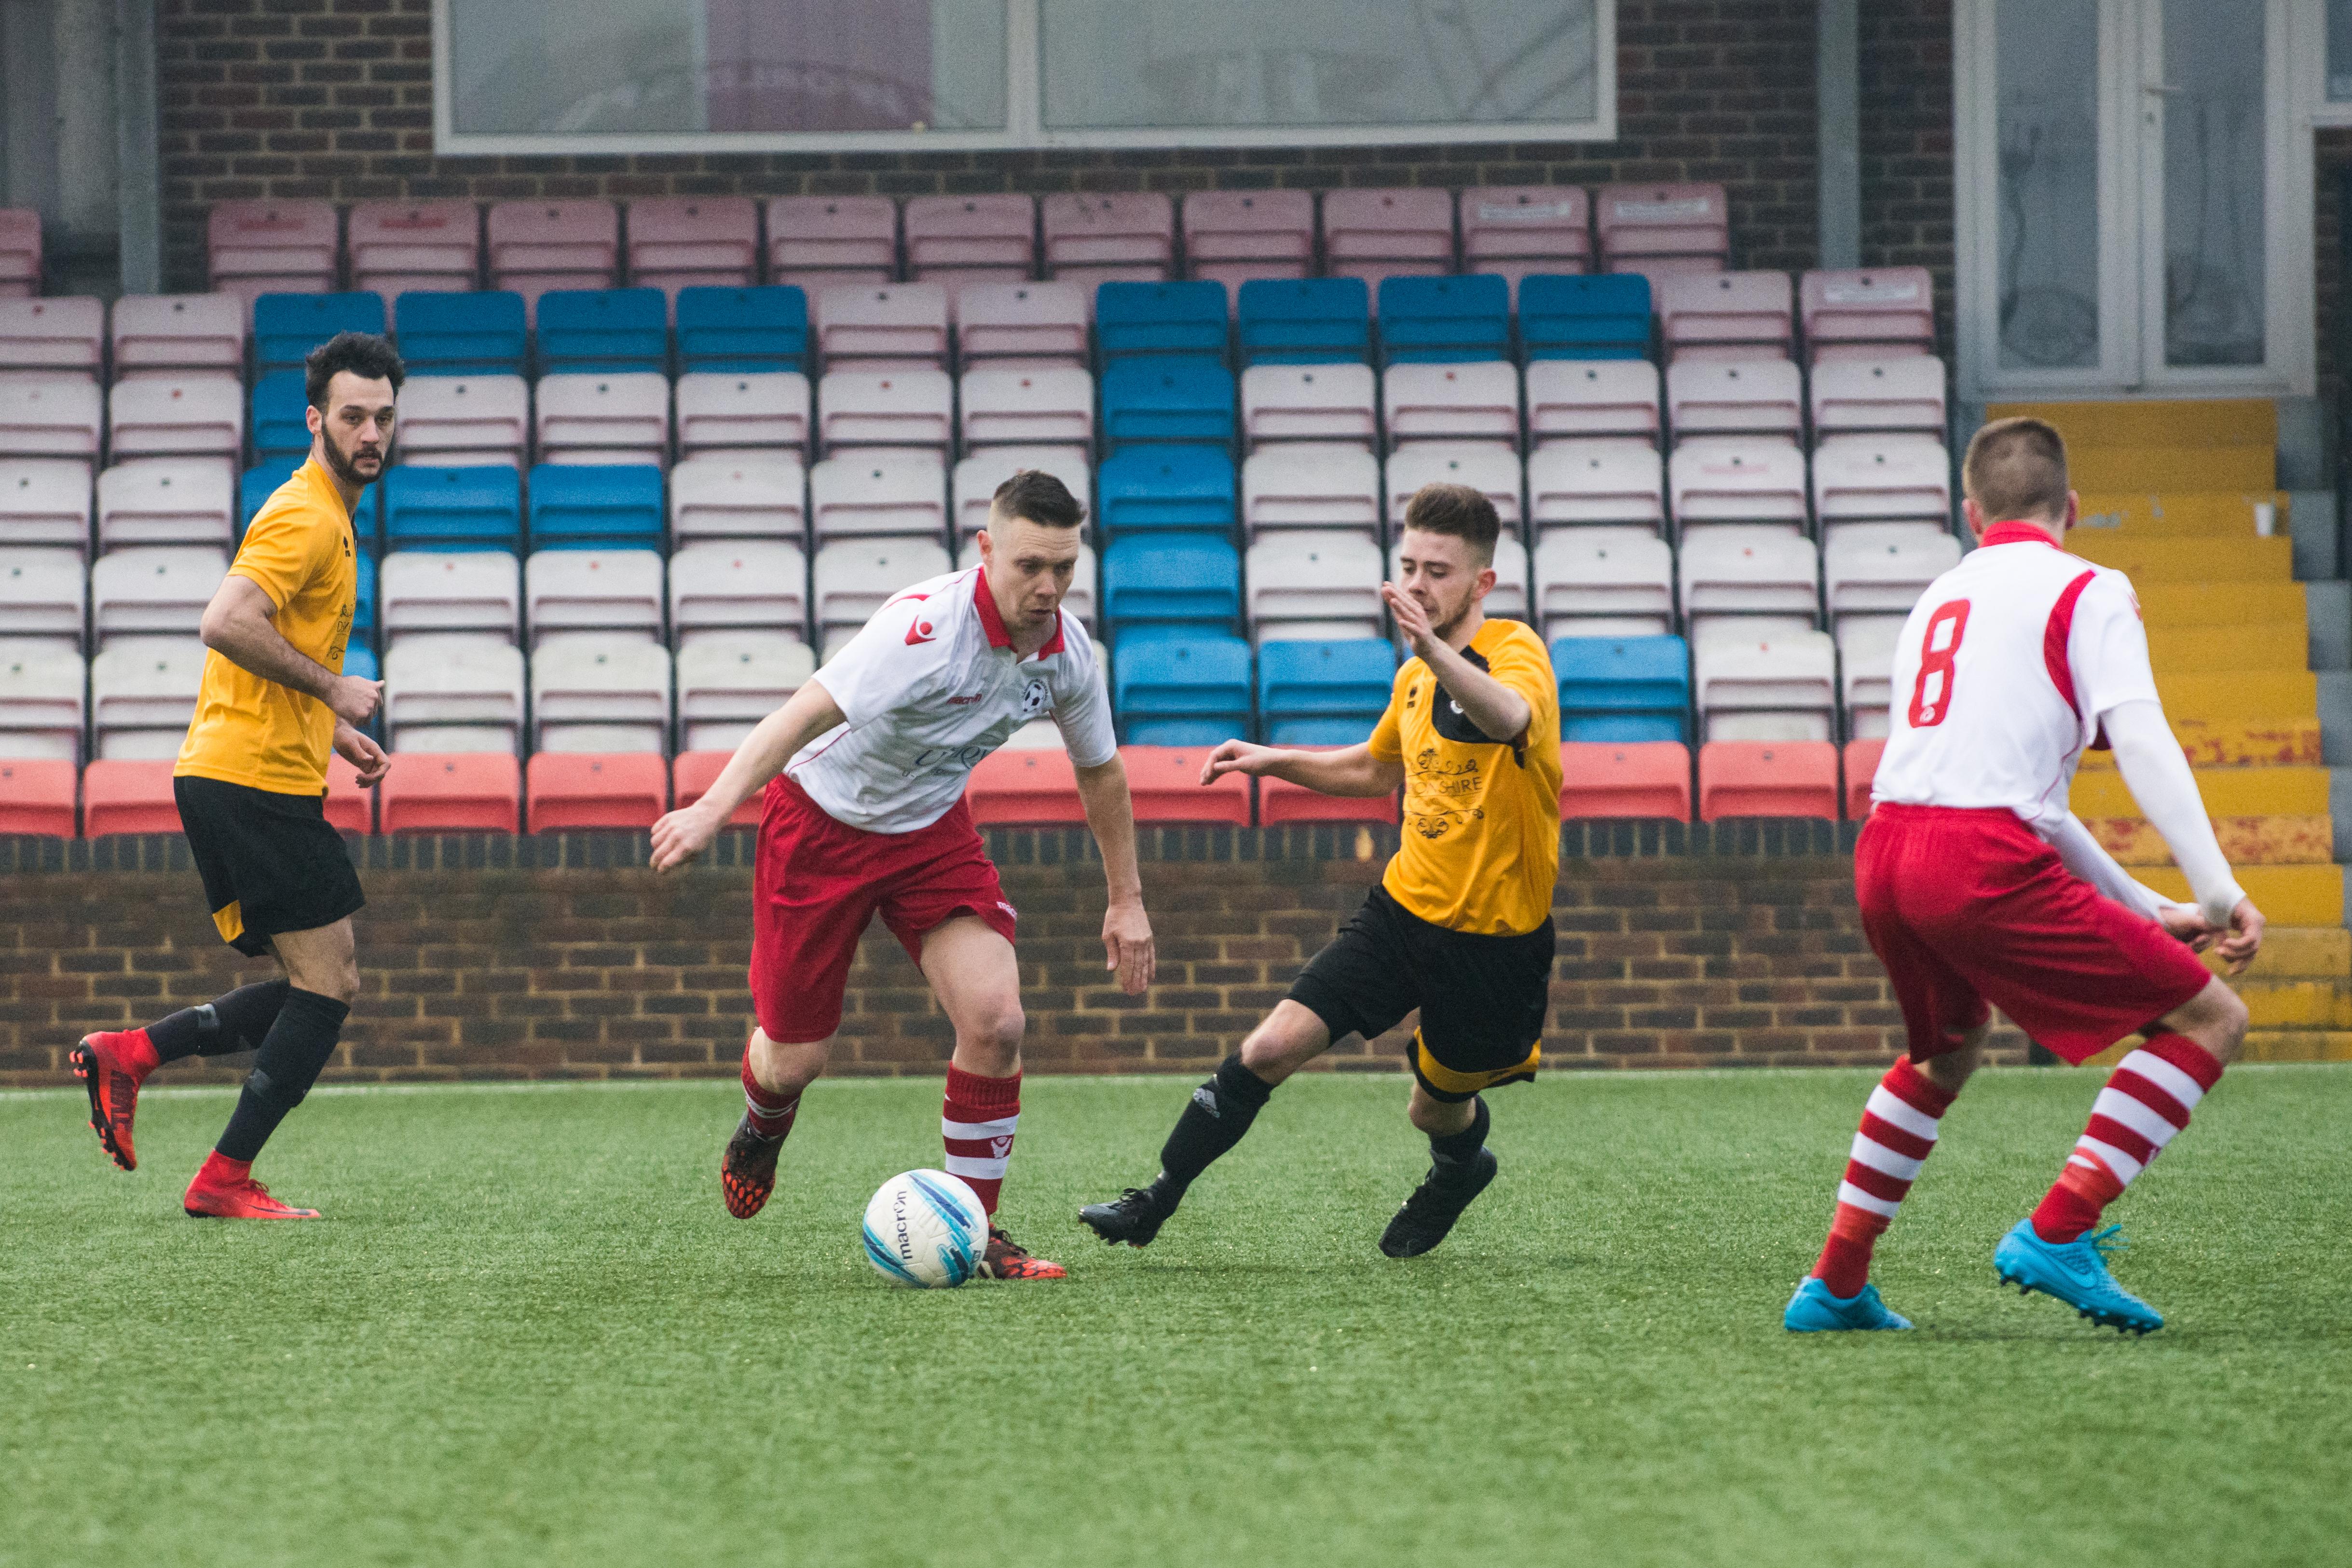 DAVID_JEFFERY Langney Wanderers FC vs Bexhill United FC 03.03.18 70